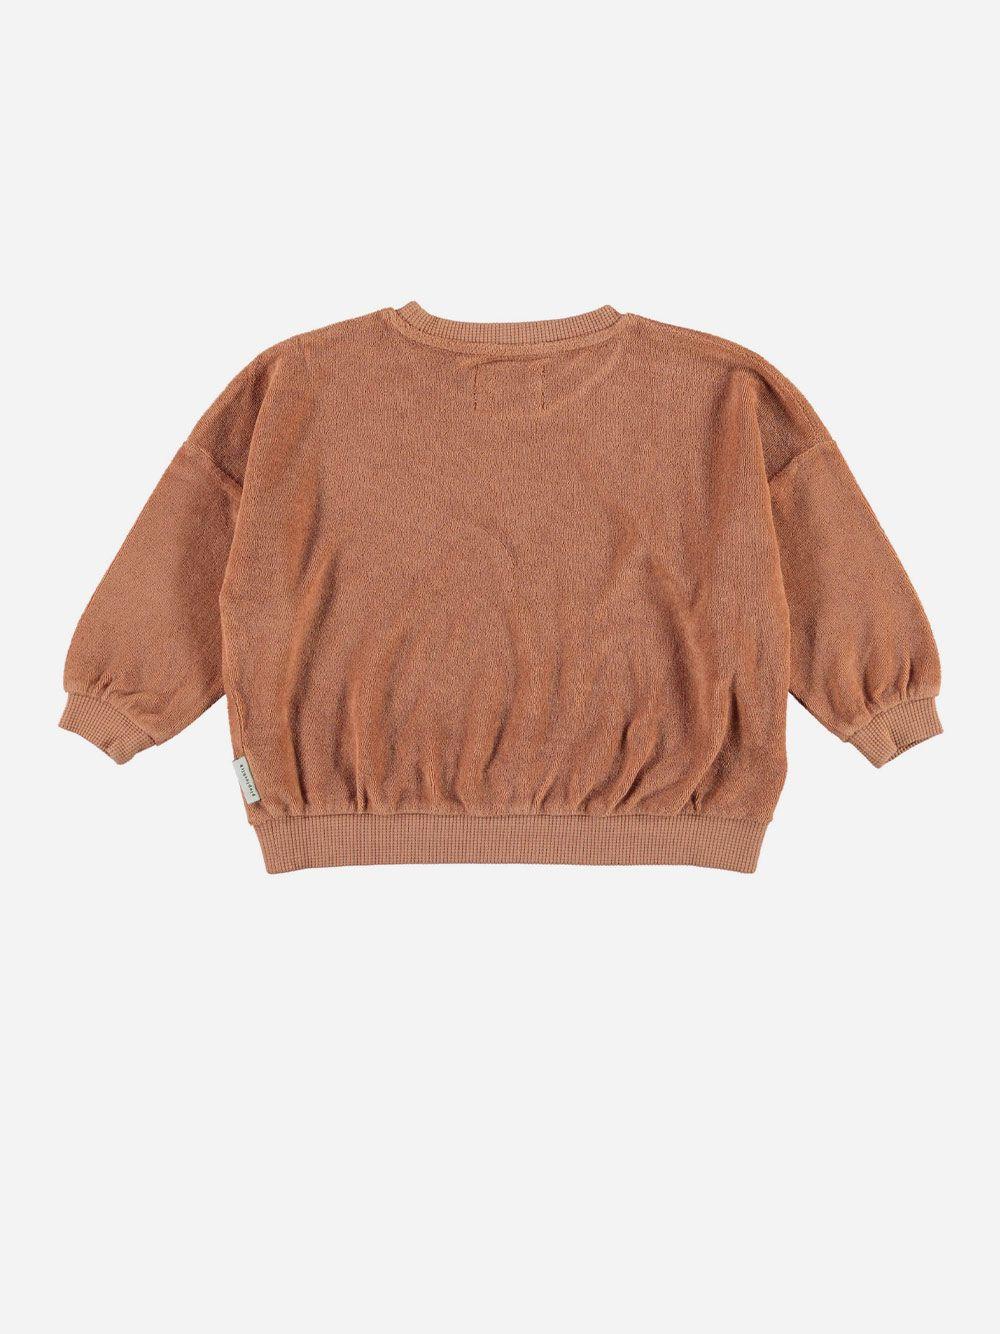 Terry Cotton Unisex Sweatshirt with